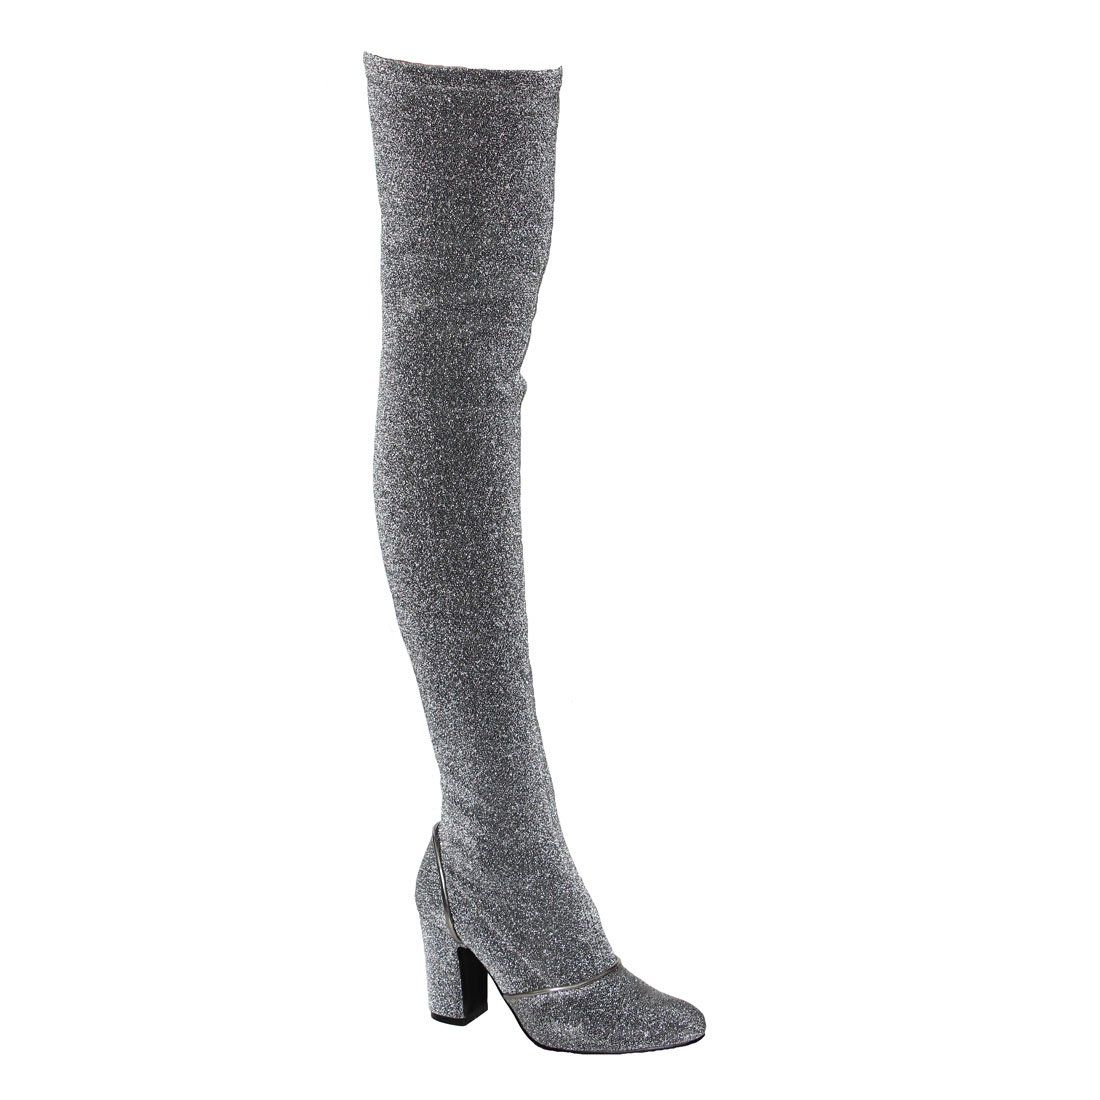 Beston ej58 womens snug fit block heel over knee high boot